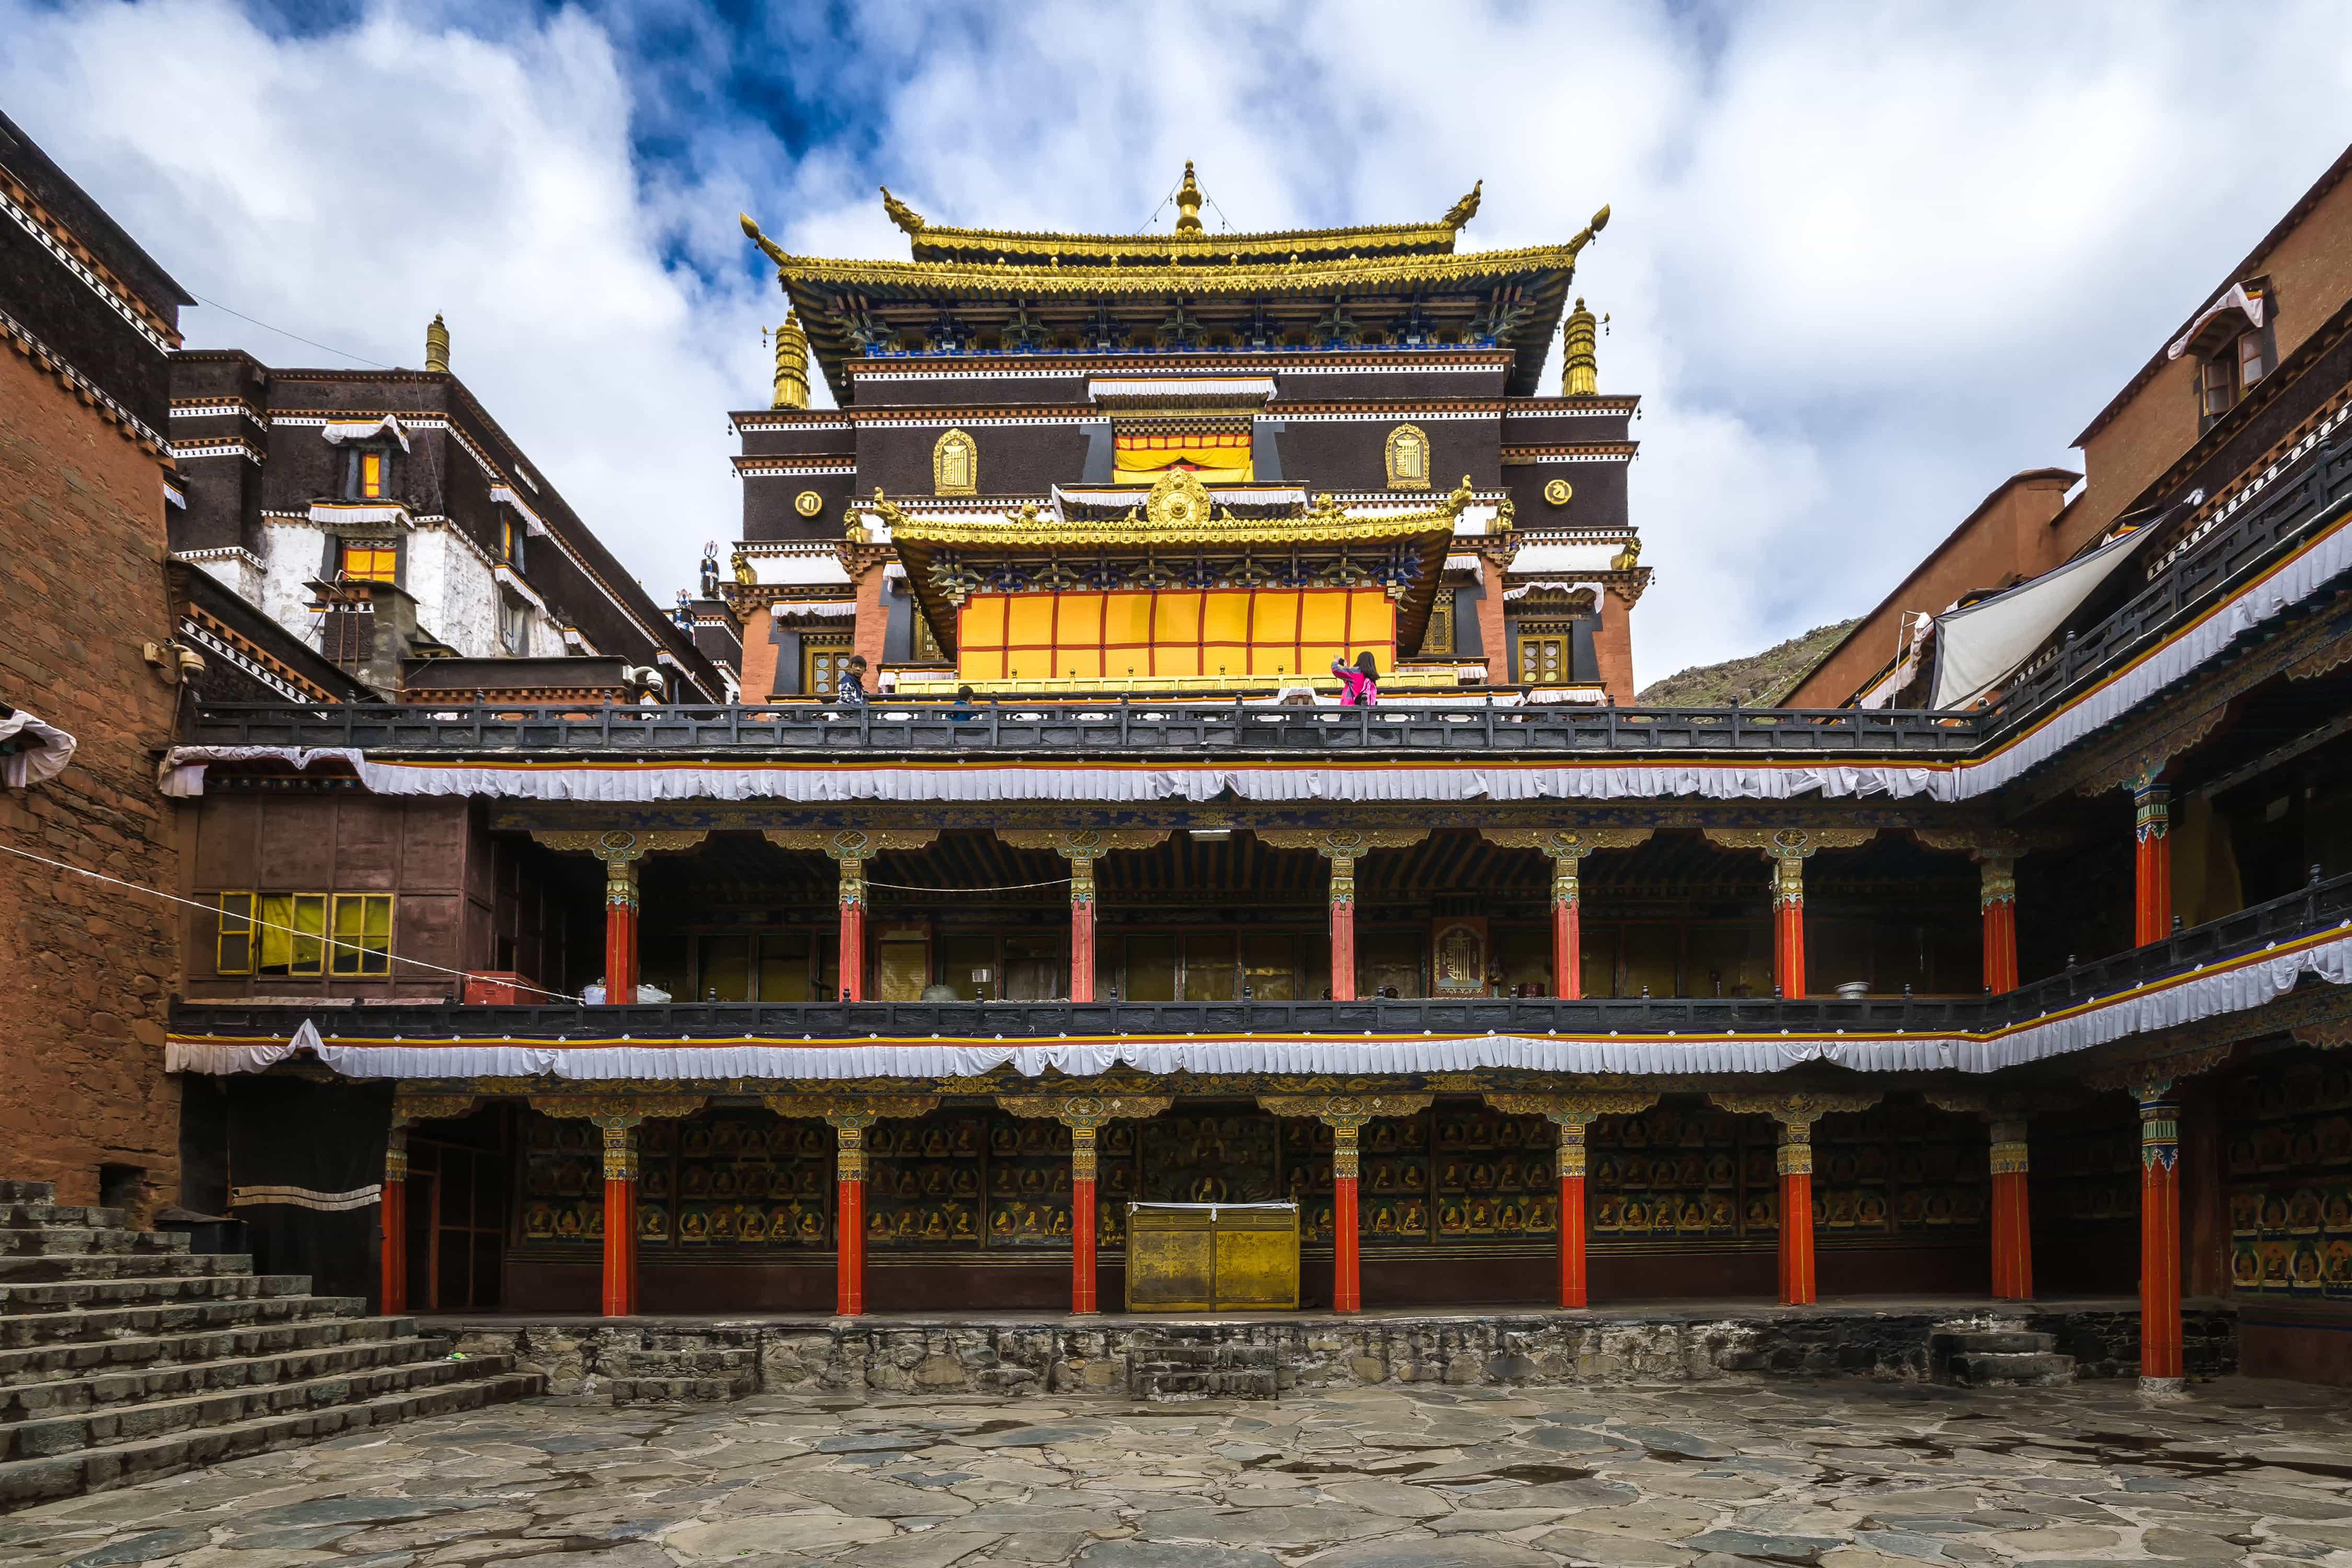 Tashilhunpo Monastery in Shigatse, Tibet